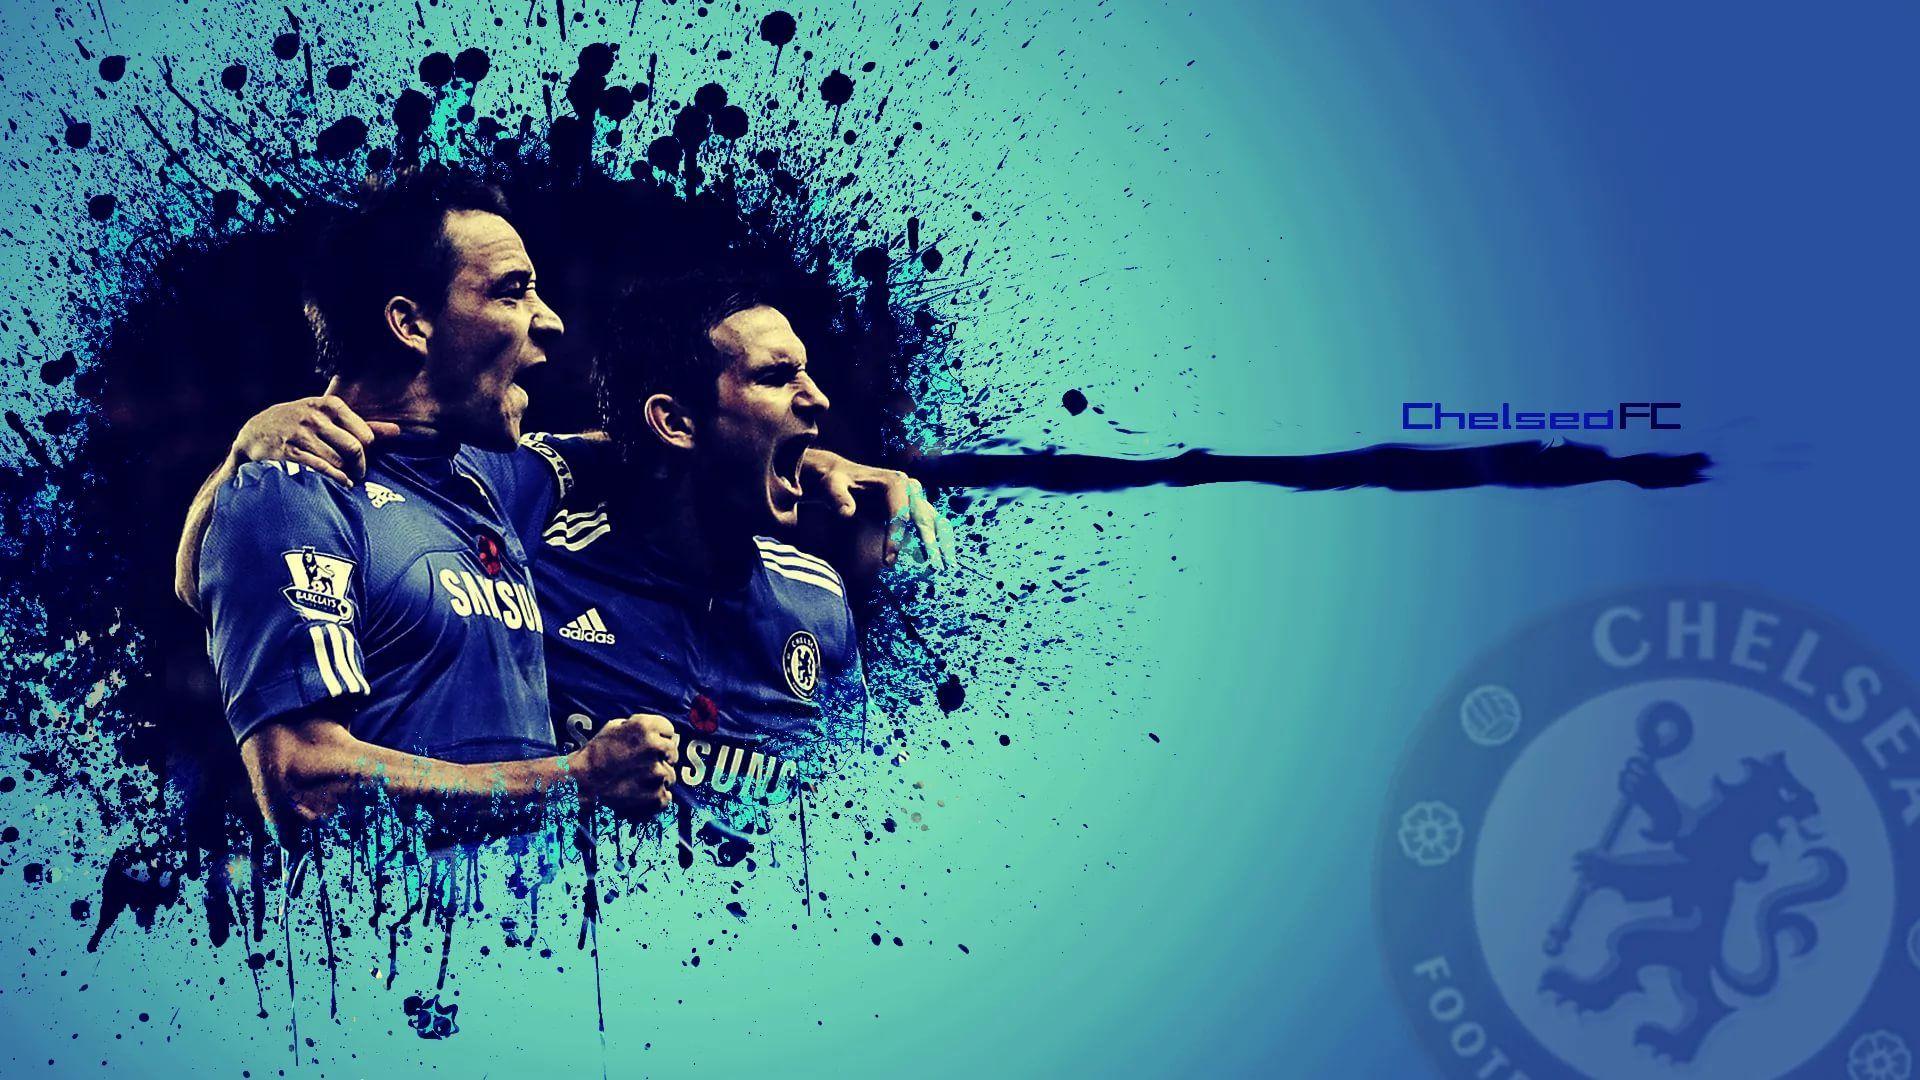 Chelsea full hd wallpaper